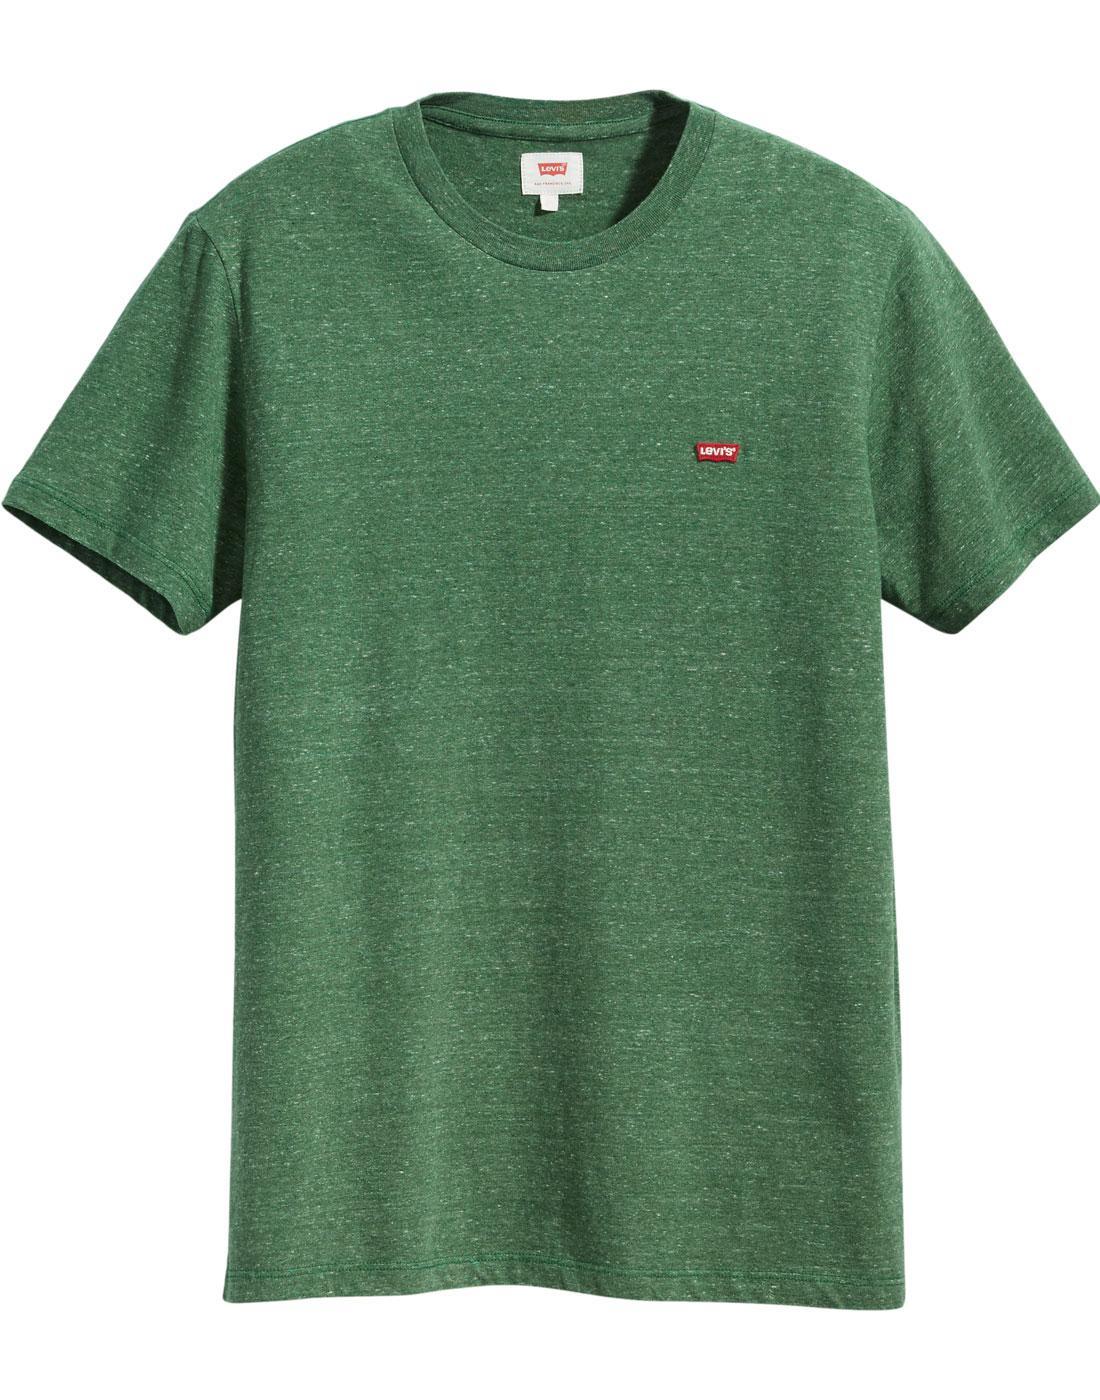 LEVI'S Original HM Retro Tri-blend Marl T-shirt PE